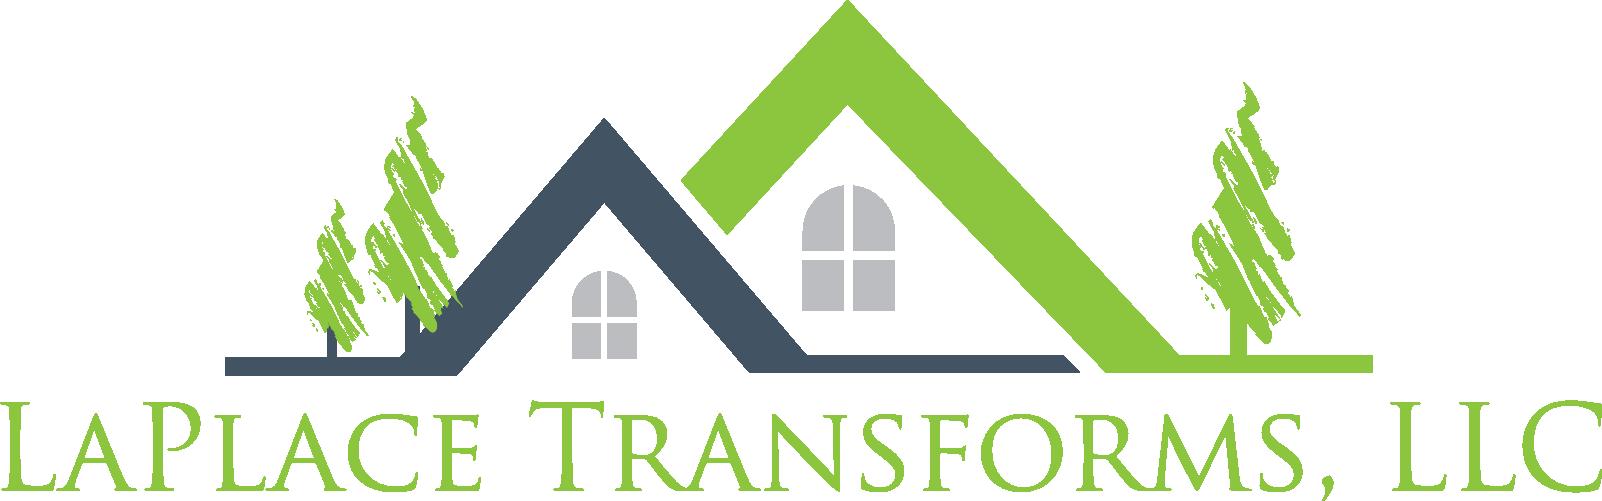 LaPlace Transforms, LLC logo